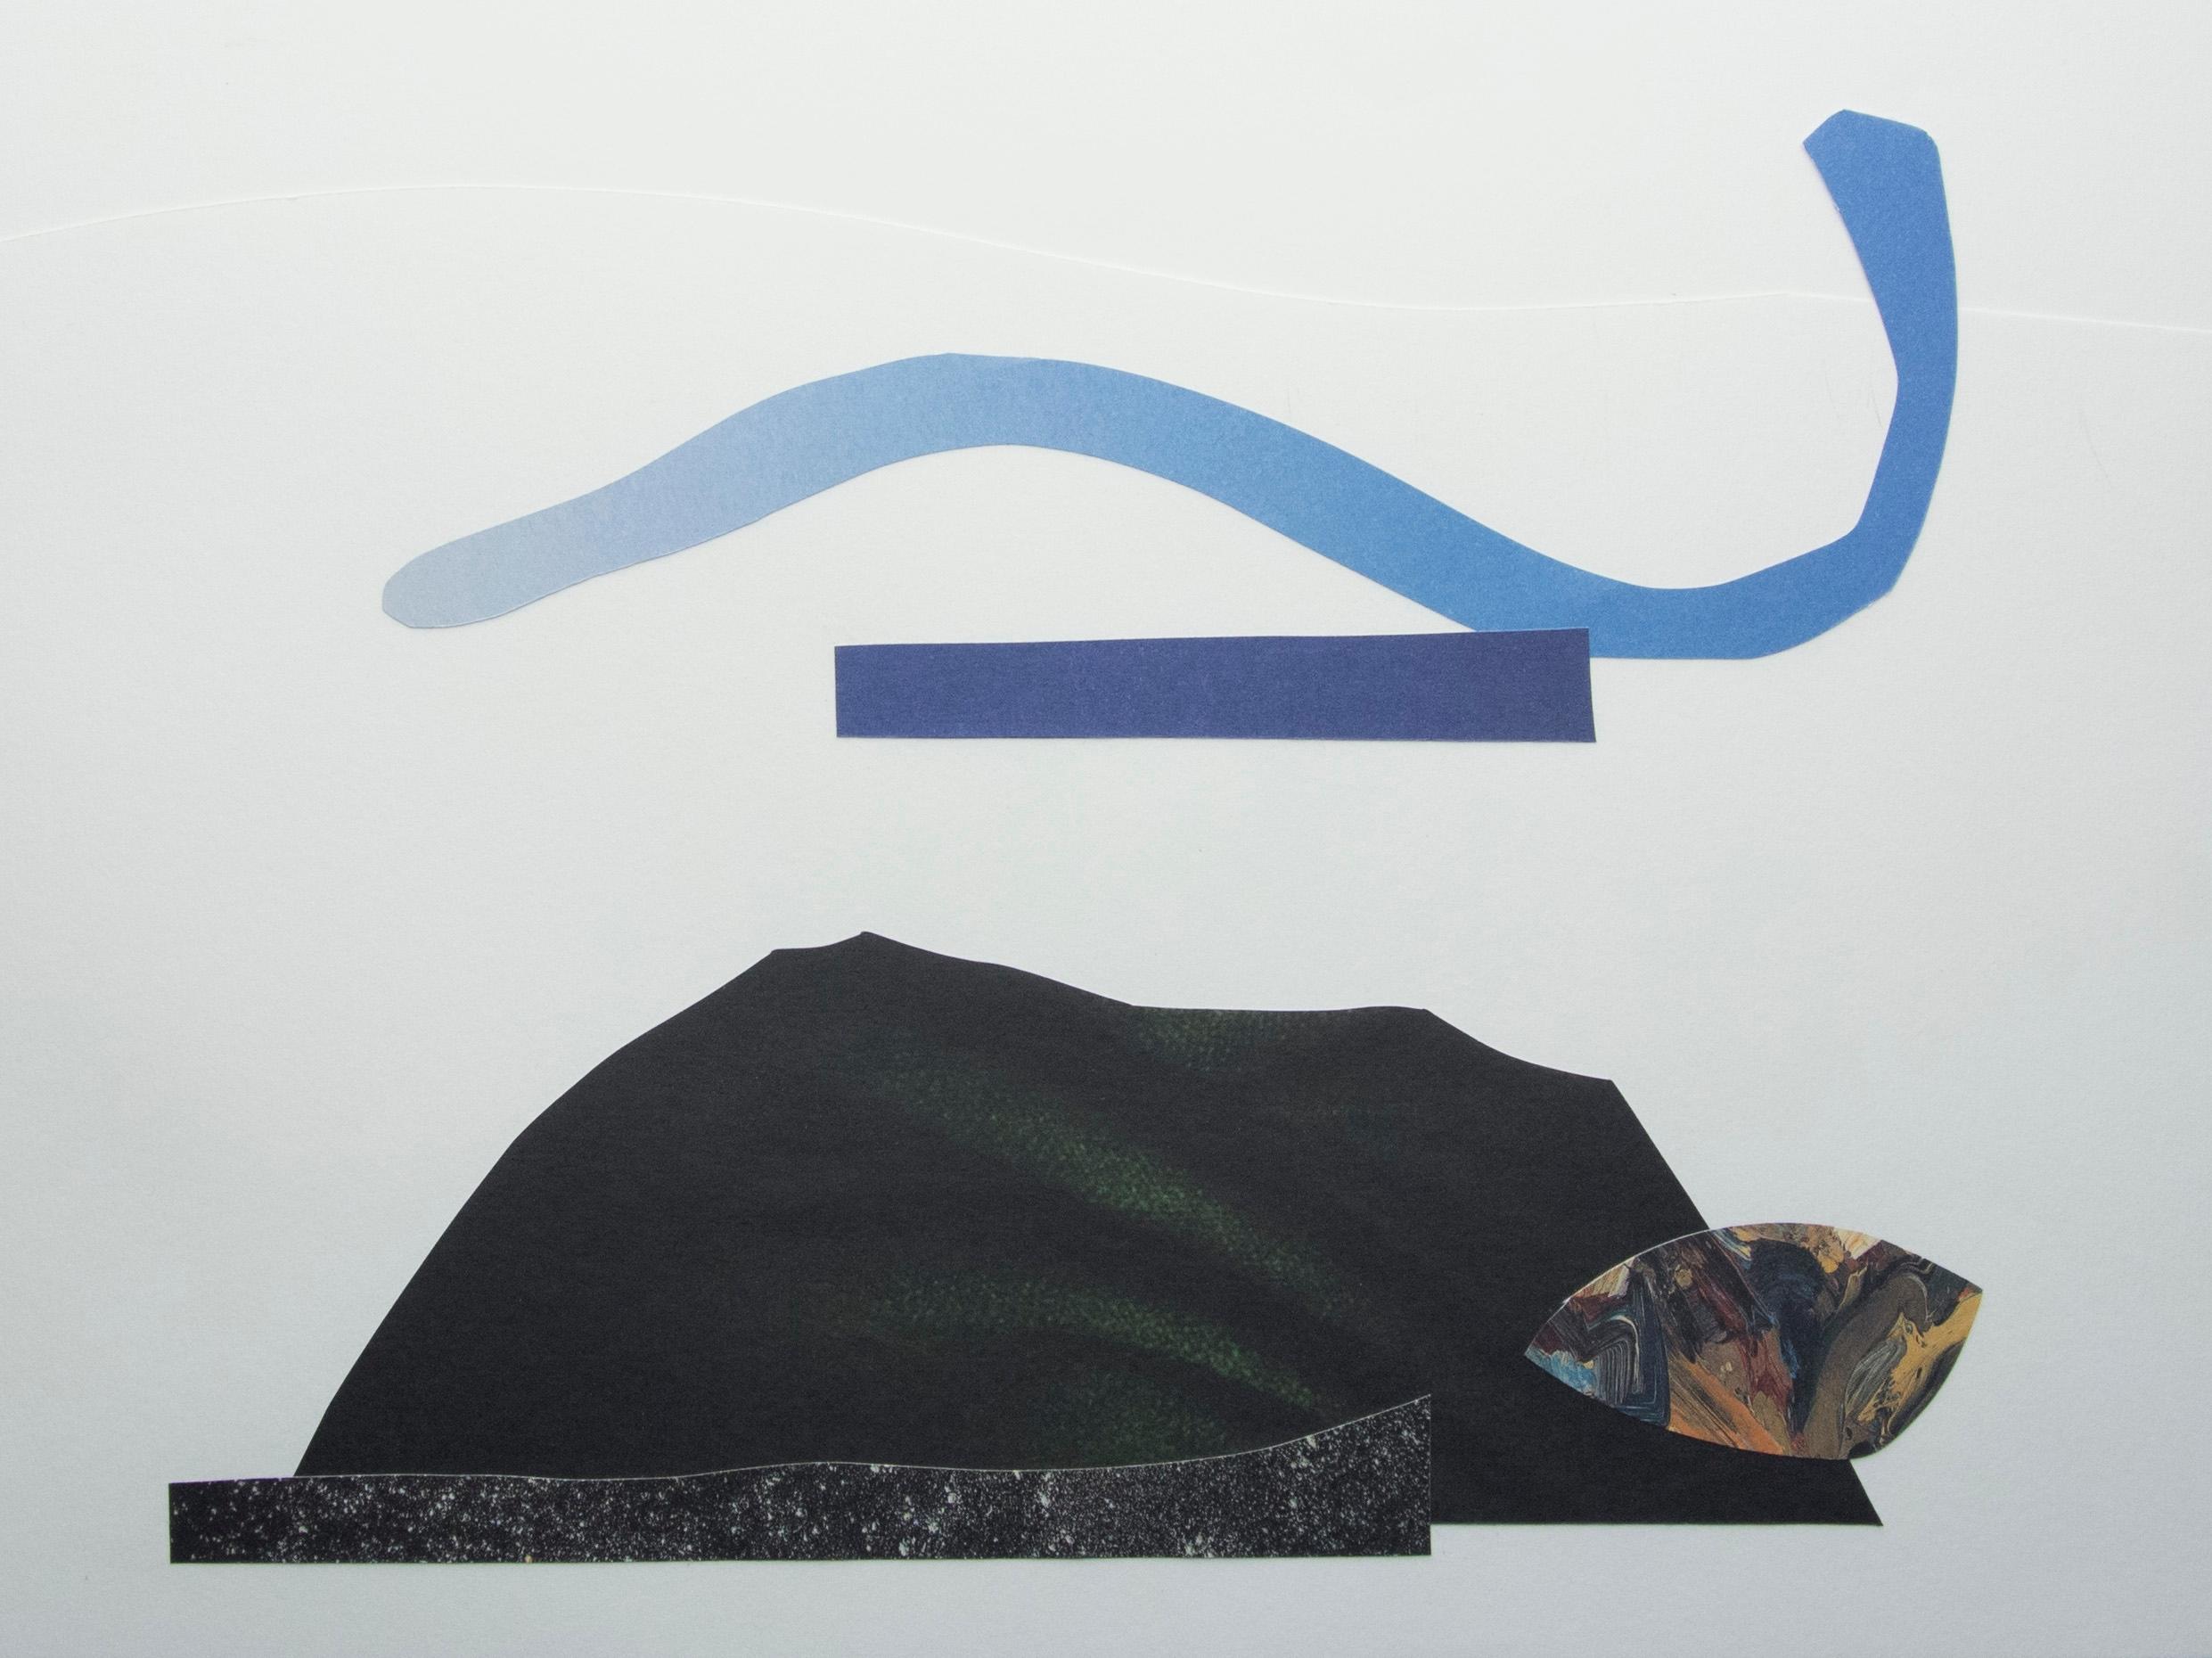 Sky, Sea ,Cloak, Collage art ab - wrjenkinson | ello